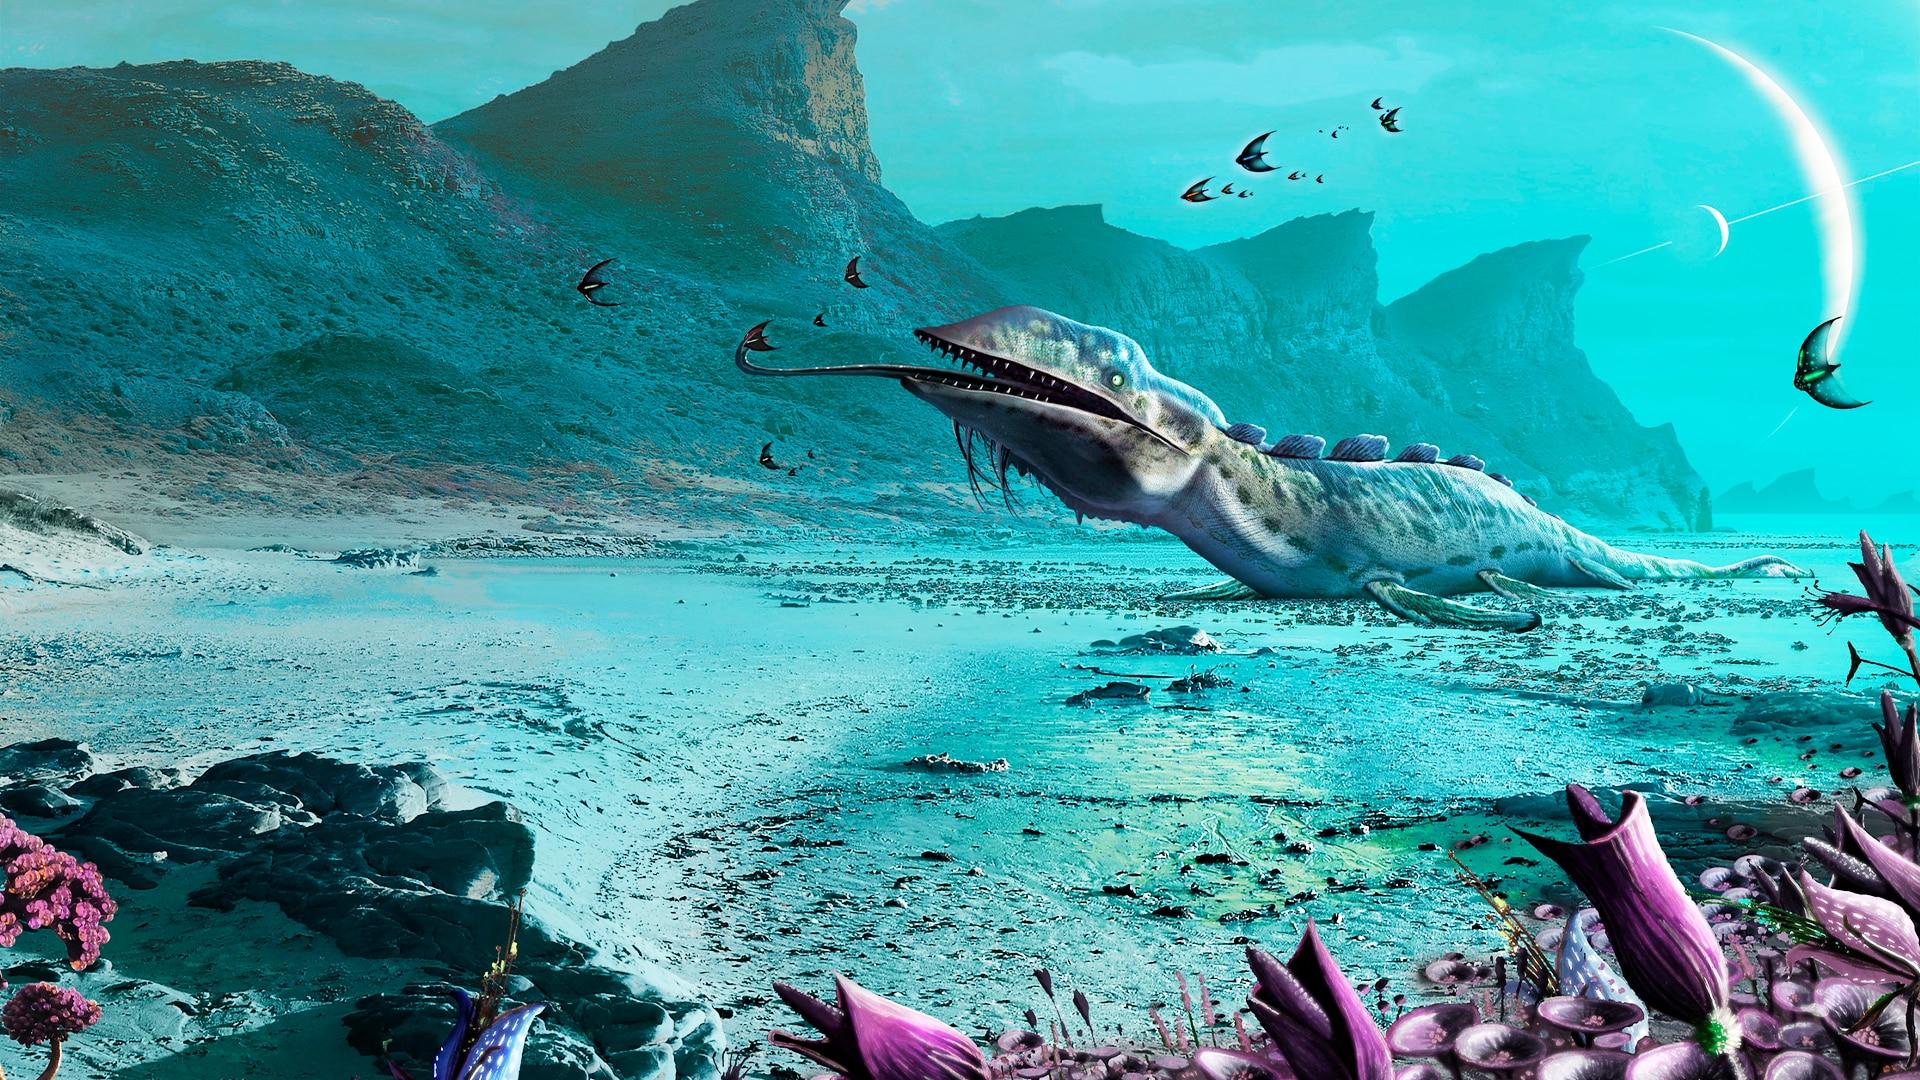 Illustration of alien world